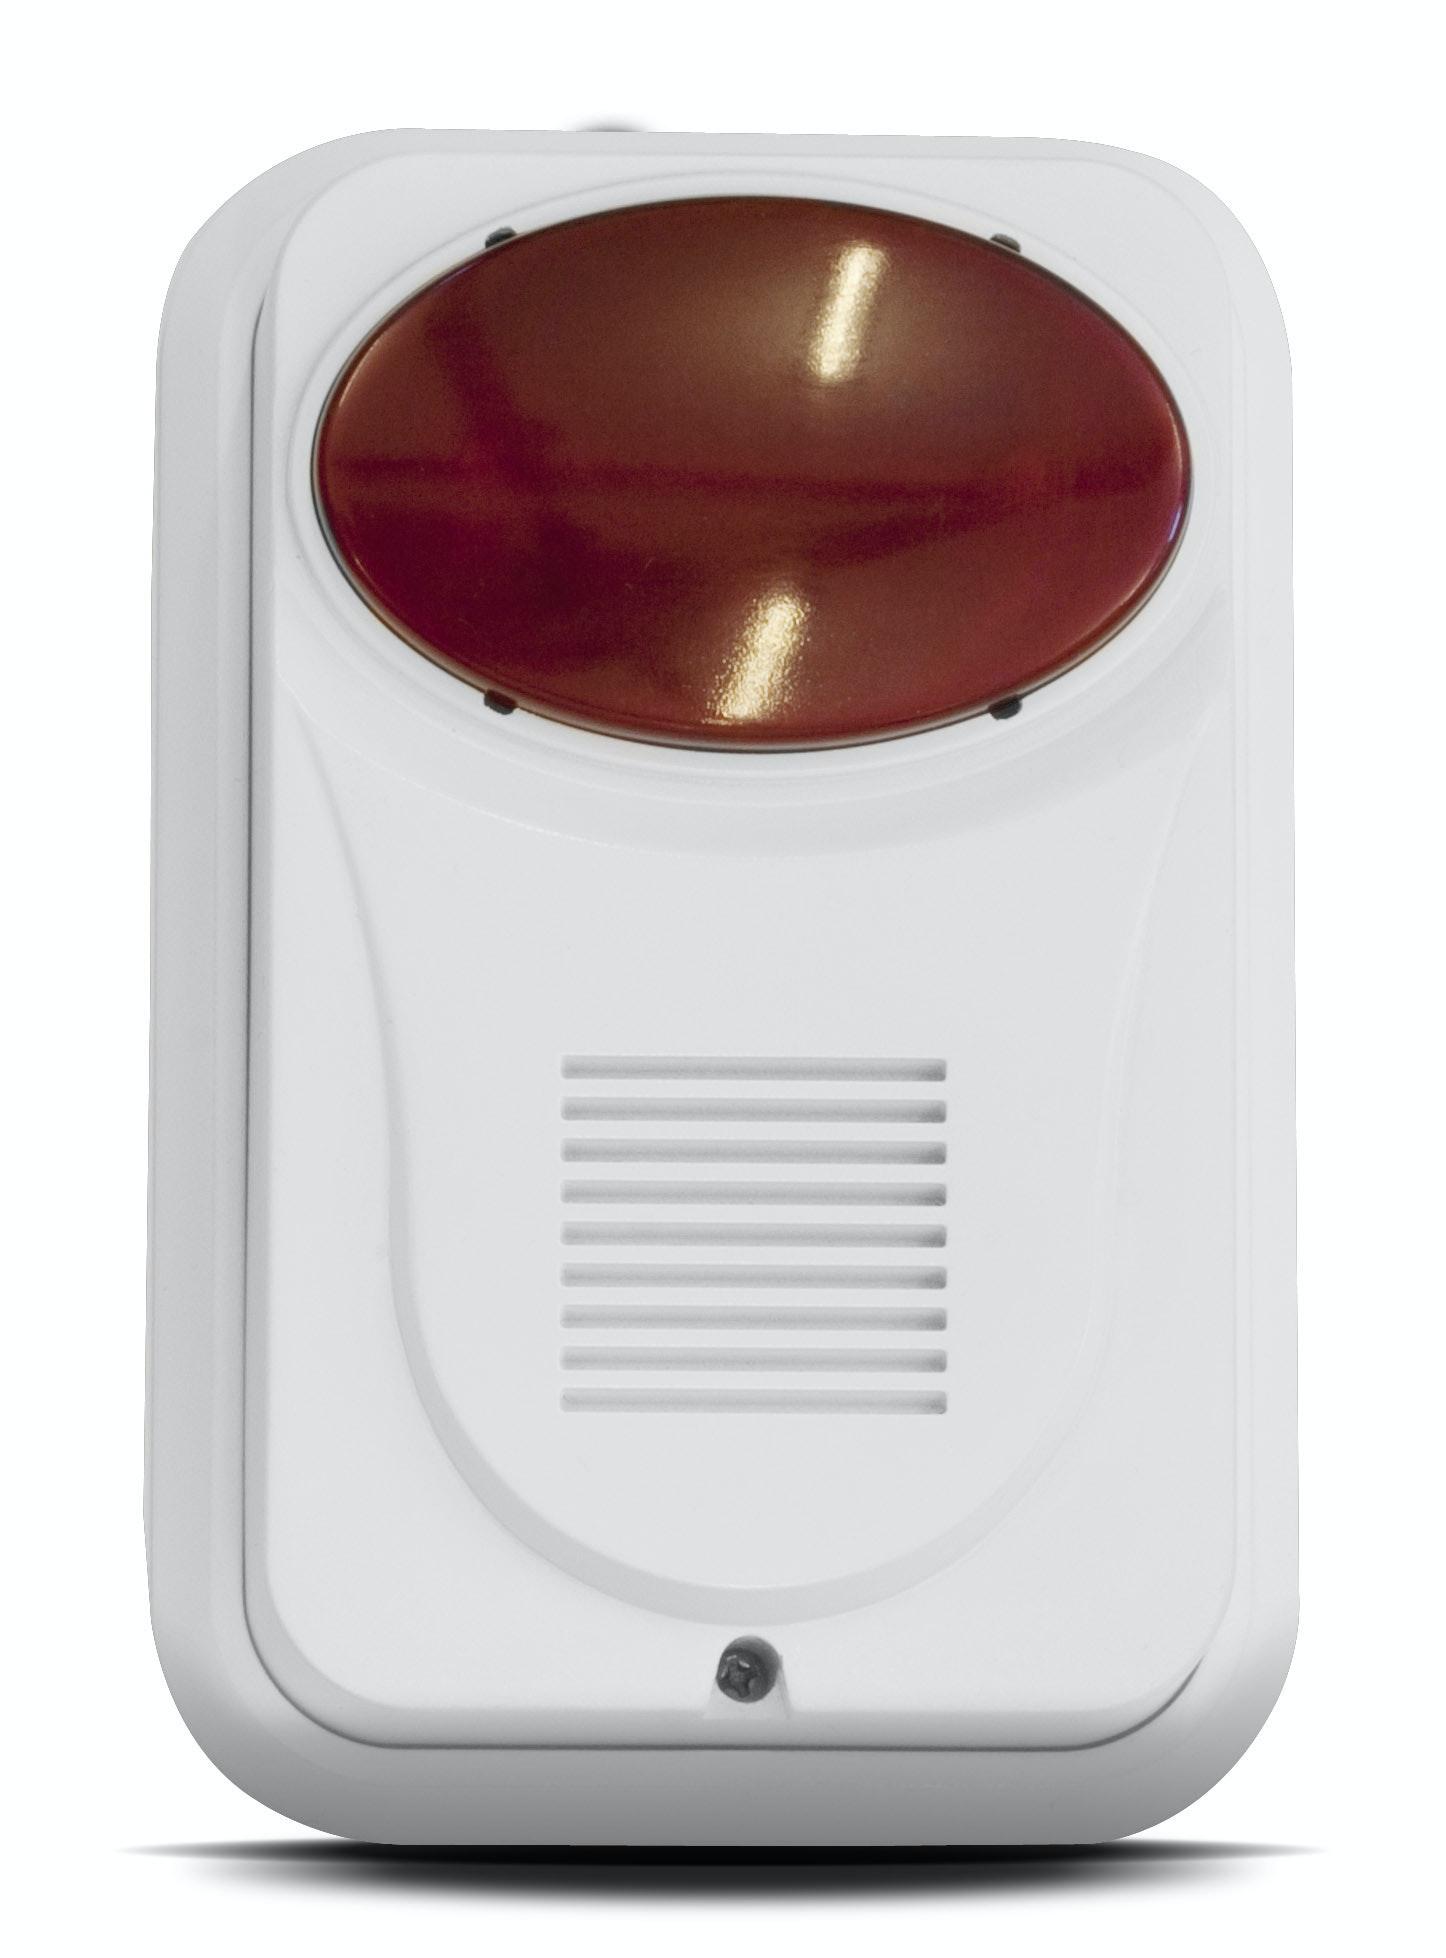 Siren Housegard Trådlös 868Mhz Hg System 1 1-Pk